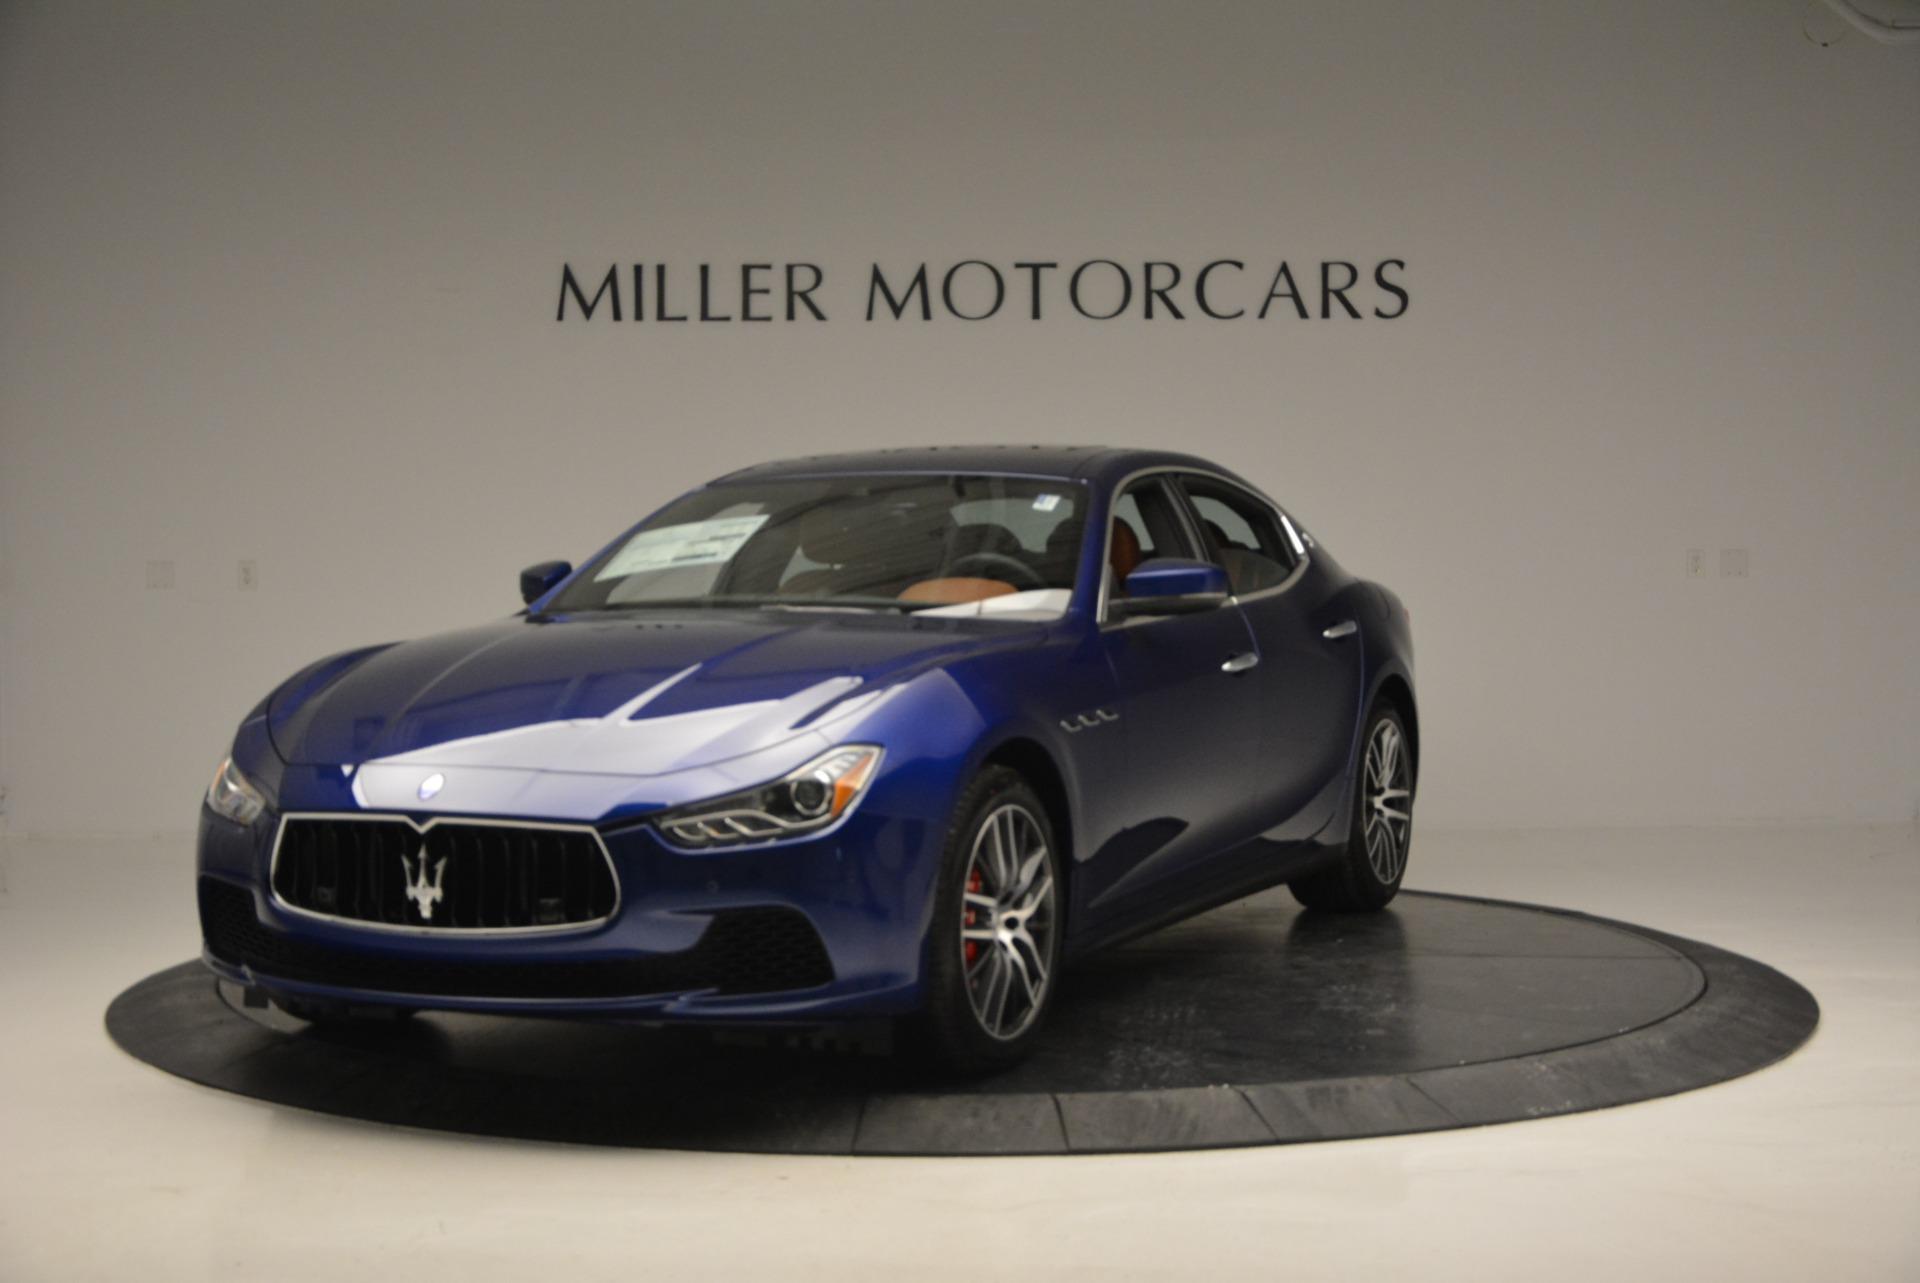 New 2017 Maserati Ghibli S Q4 For Sale In Greenwich, CT 767_main